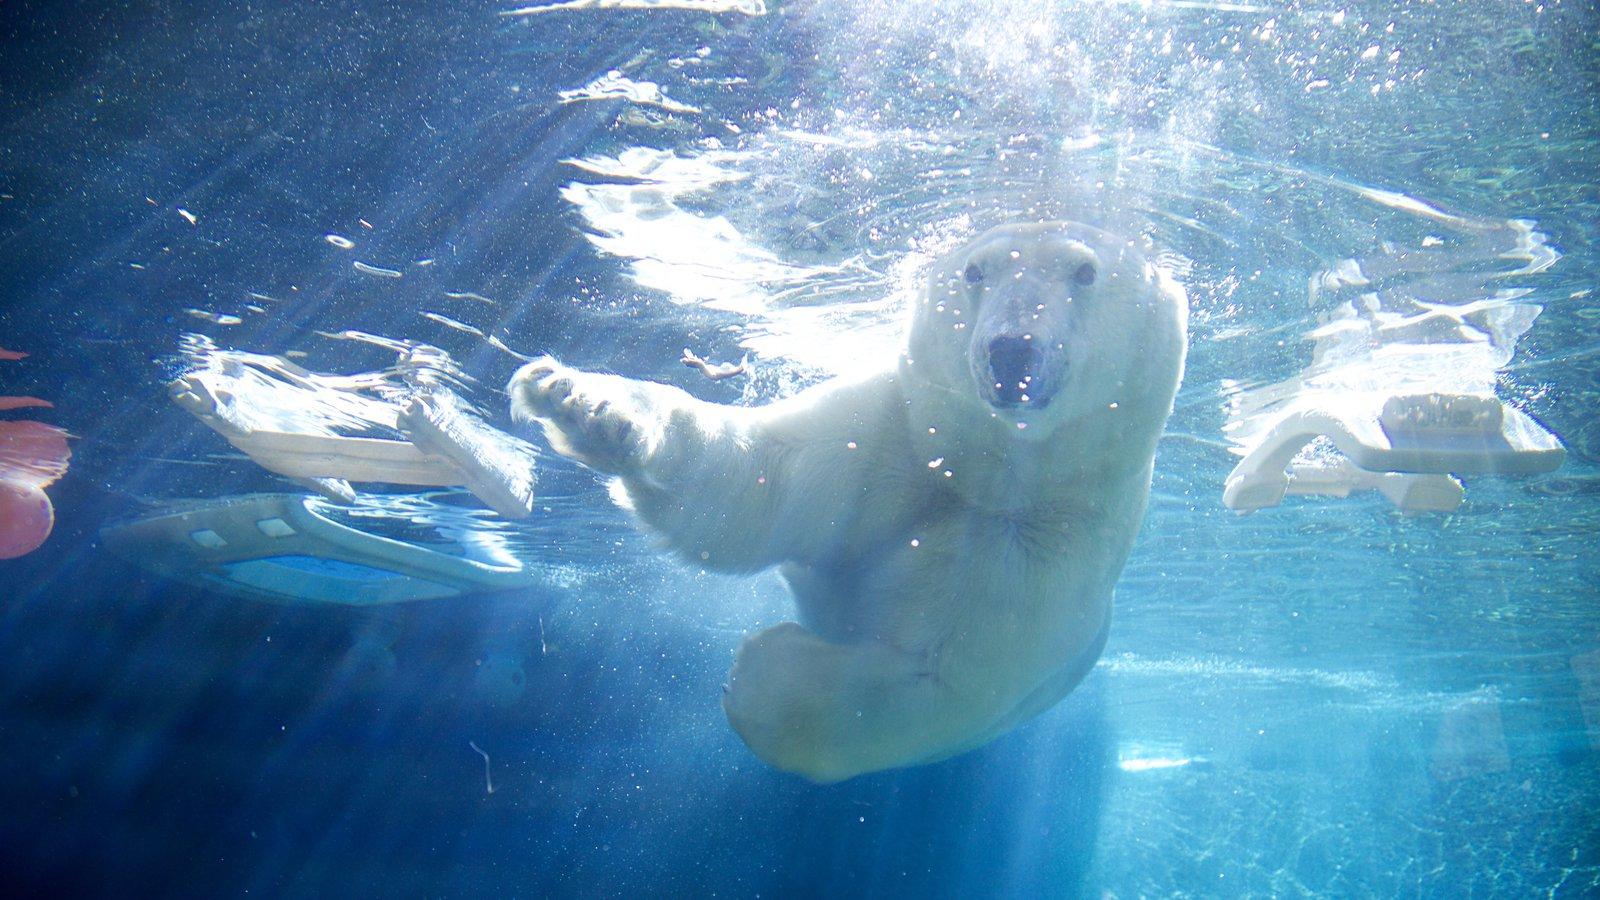 Point Defiance Zoo and Aquarium mostrando vida marinha